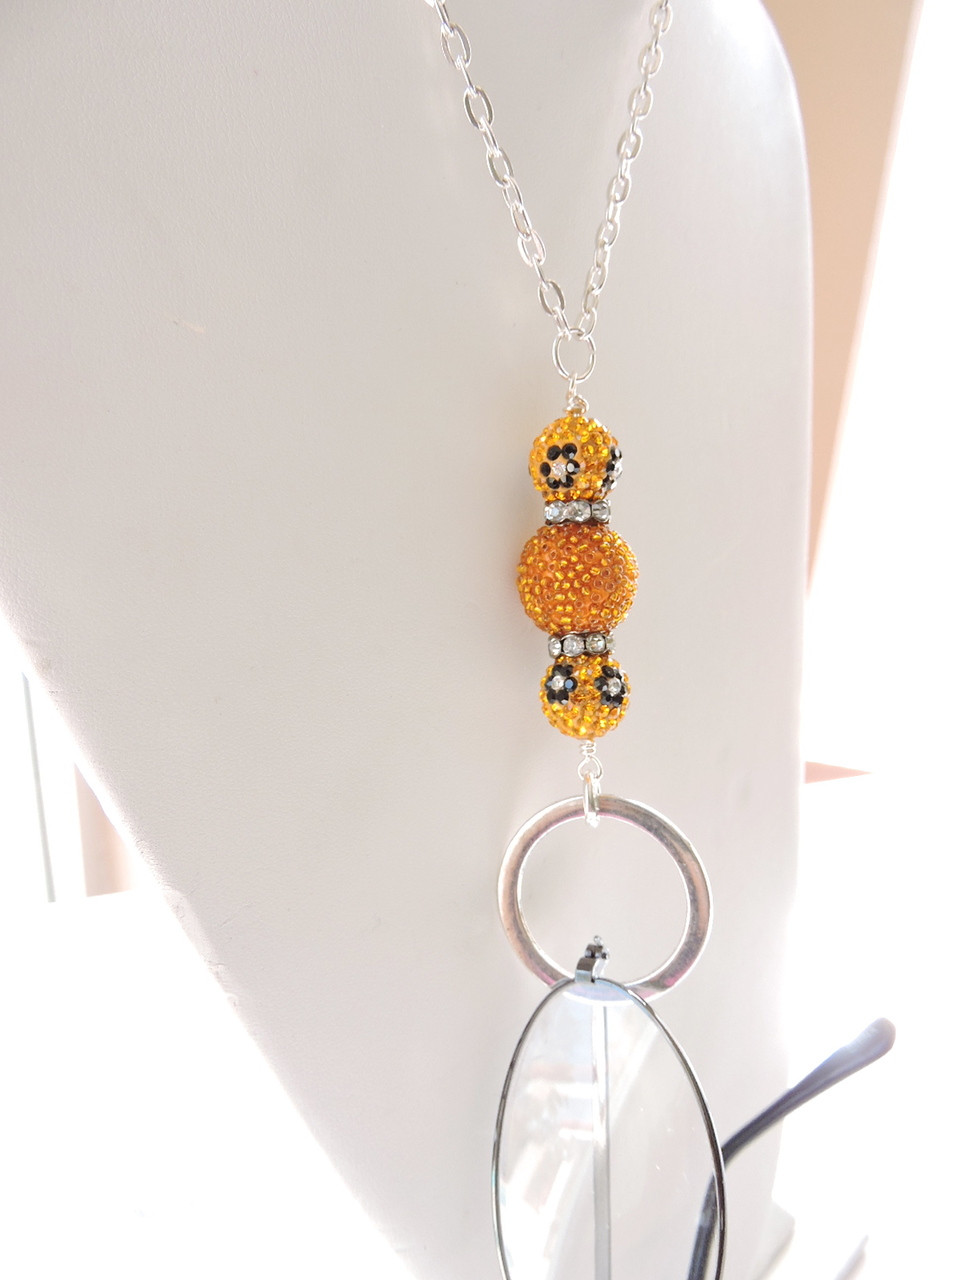 7134792281c Eyeglasses Lanyard - Lovely Orange Bling Glasses Chain Lanyard - Reading eyeglasses  Holder - Eyeglass Necklace